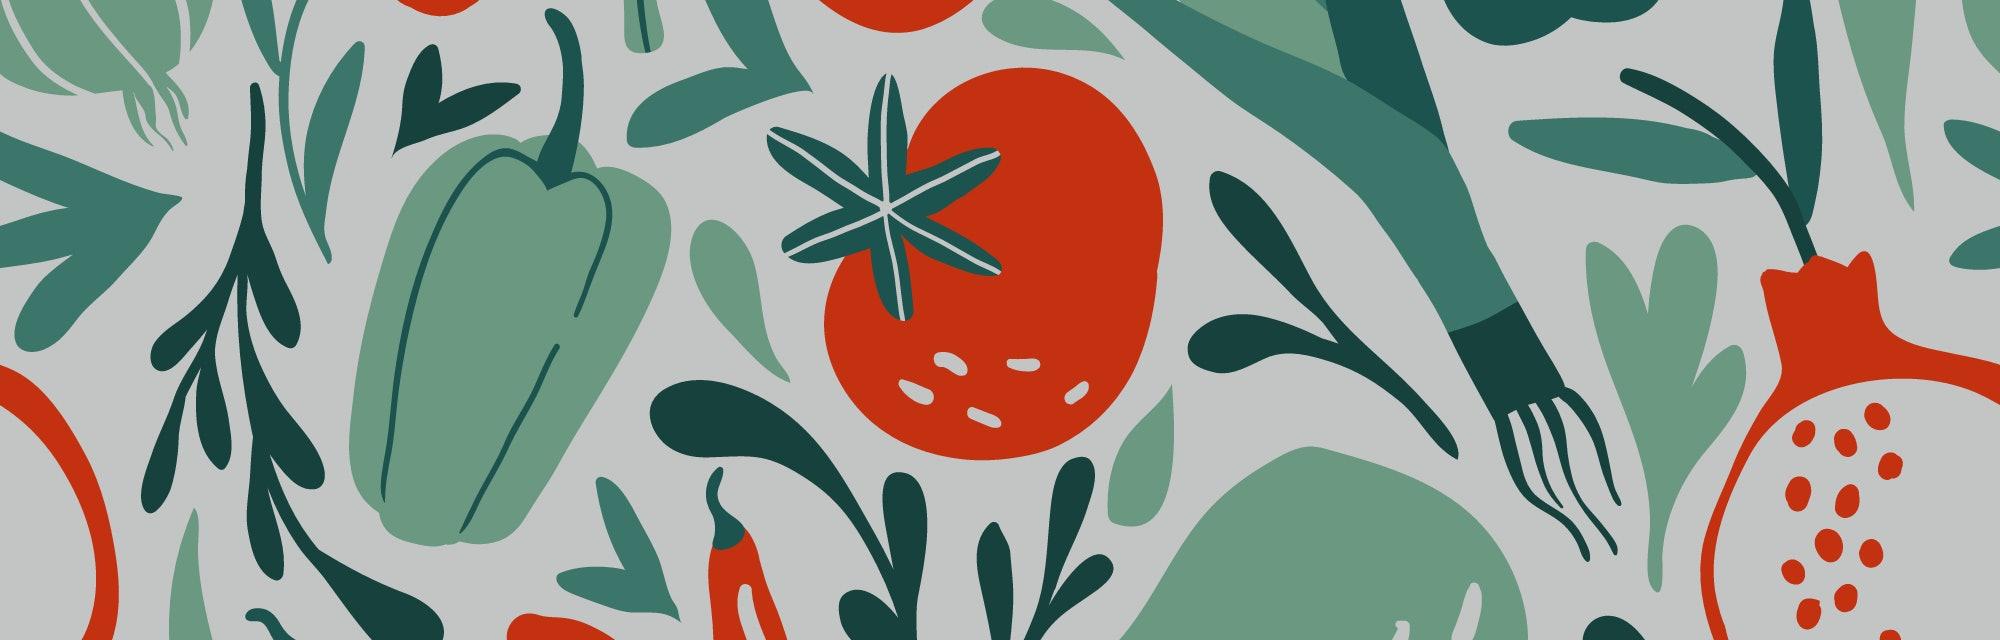 Seamless pattern with hand drawn red and green fruits, berries, vegetables. Flat pepper, tomato, leek, broccoli, garnet, cucumber. Vegetarian healthy food vector texture. Vegan, farm, organic, detox